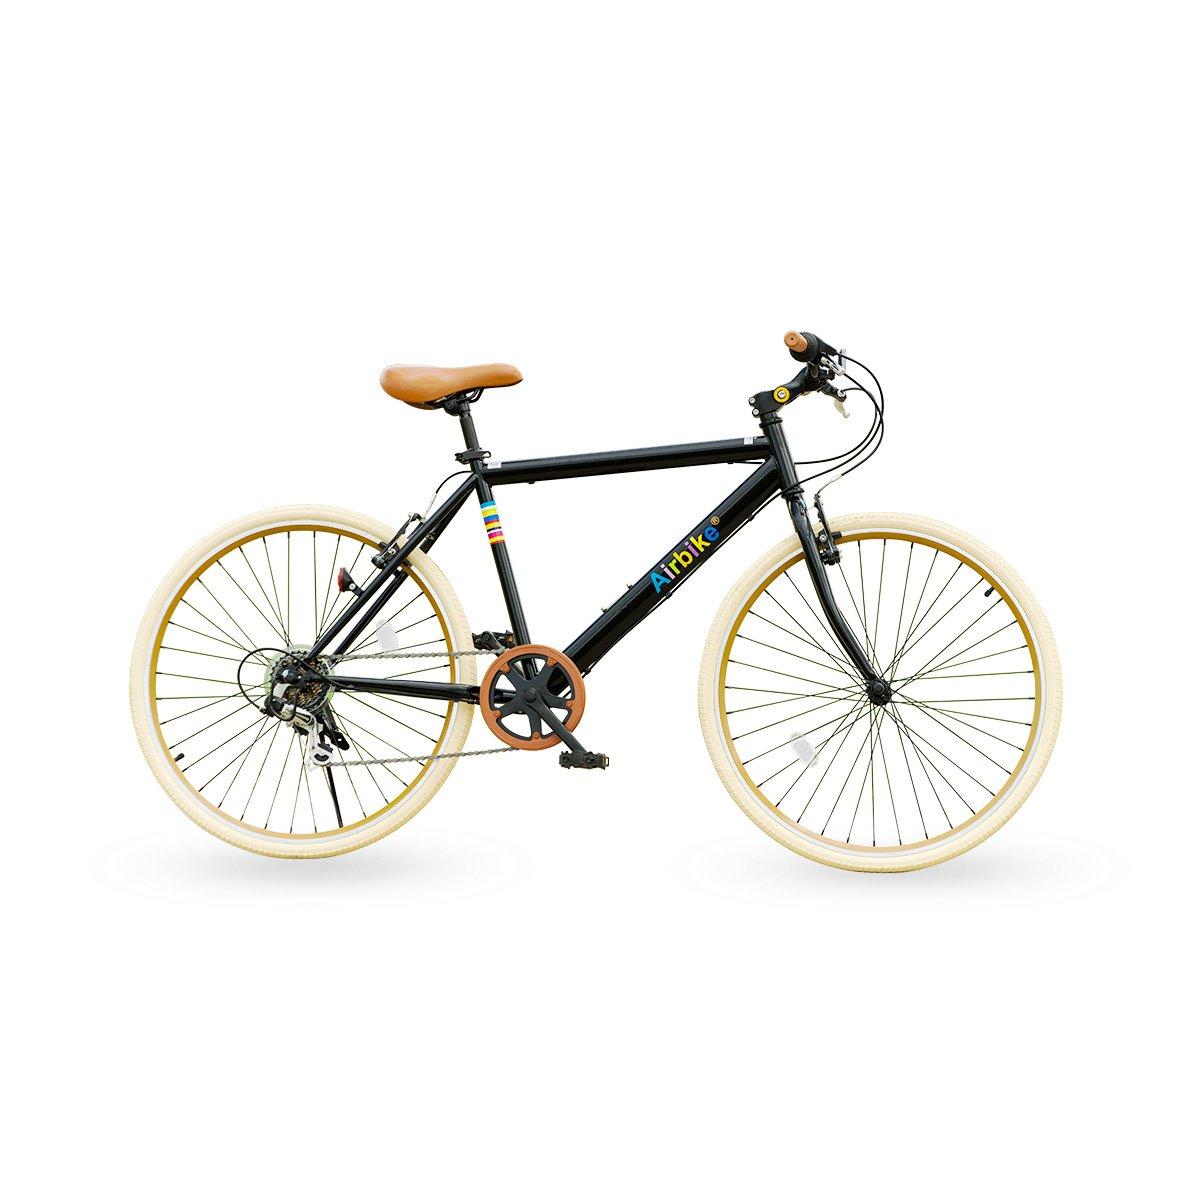 Airbike クロスバイク 自転車 26インチタイヤ シマノ7段変速 B01JING3VE ブラック×ナチュラル ブラック×ナチュラル